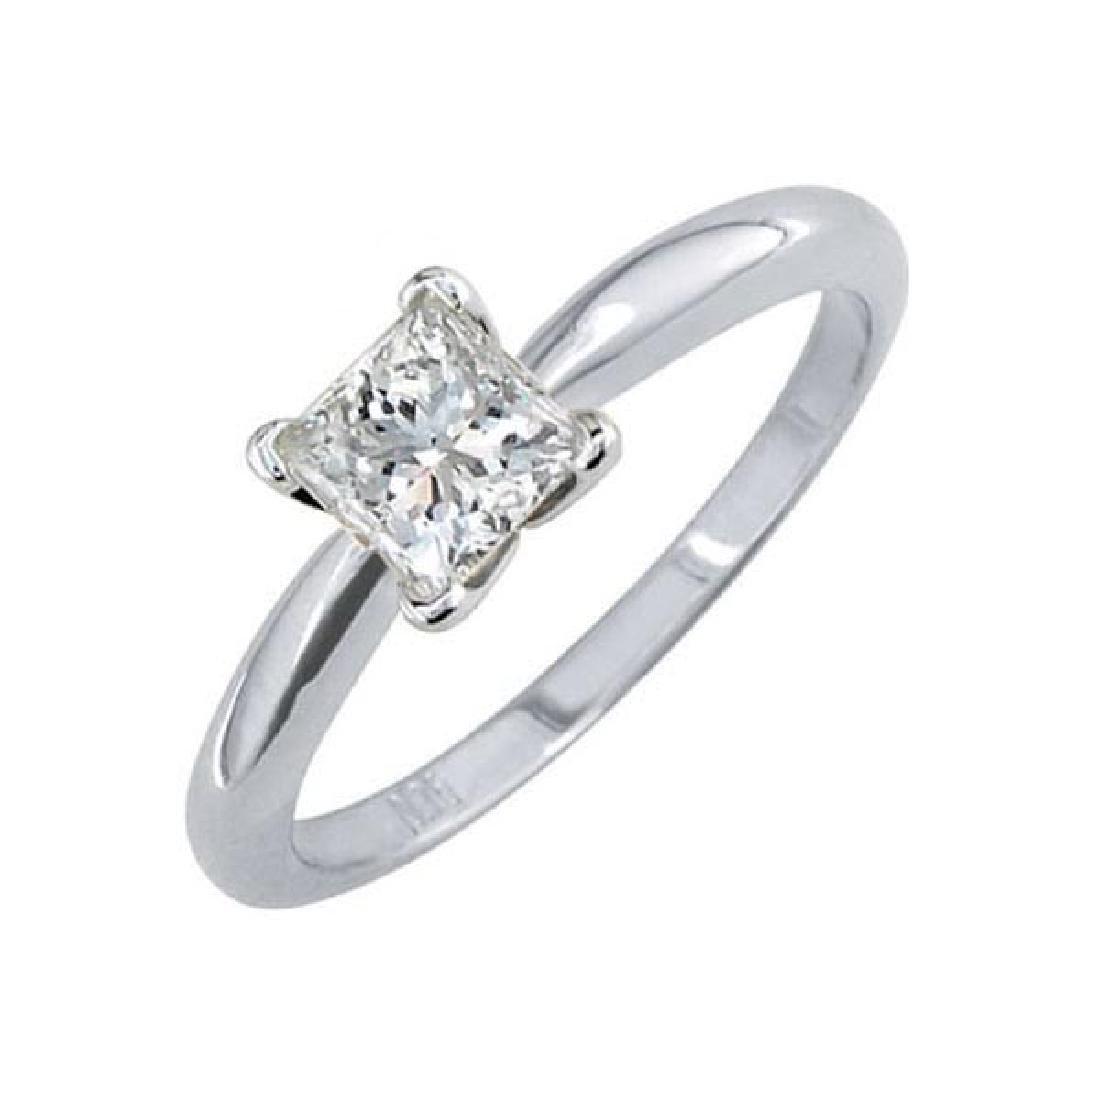 Certified 1.06 CTW Princess Diamond Solitaire 14k Ring